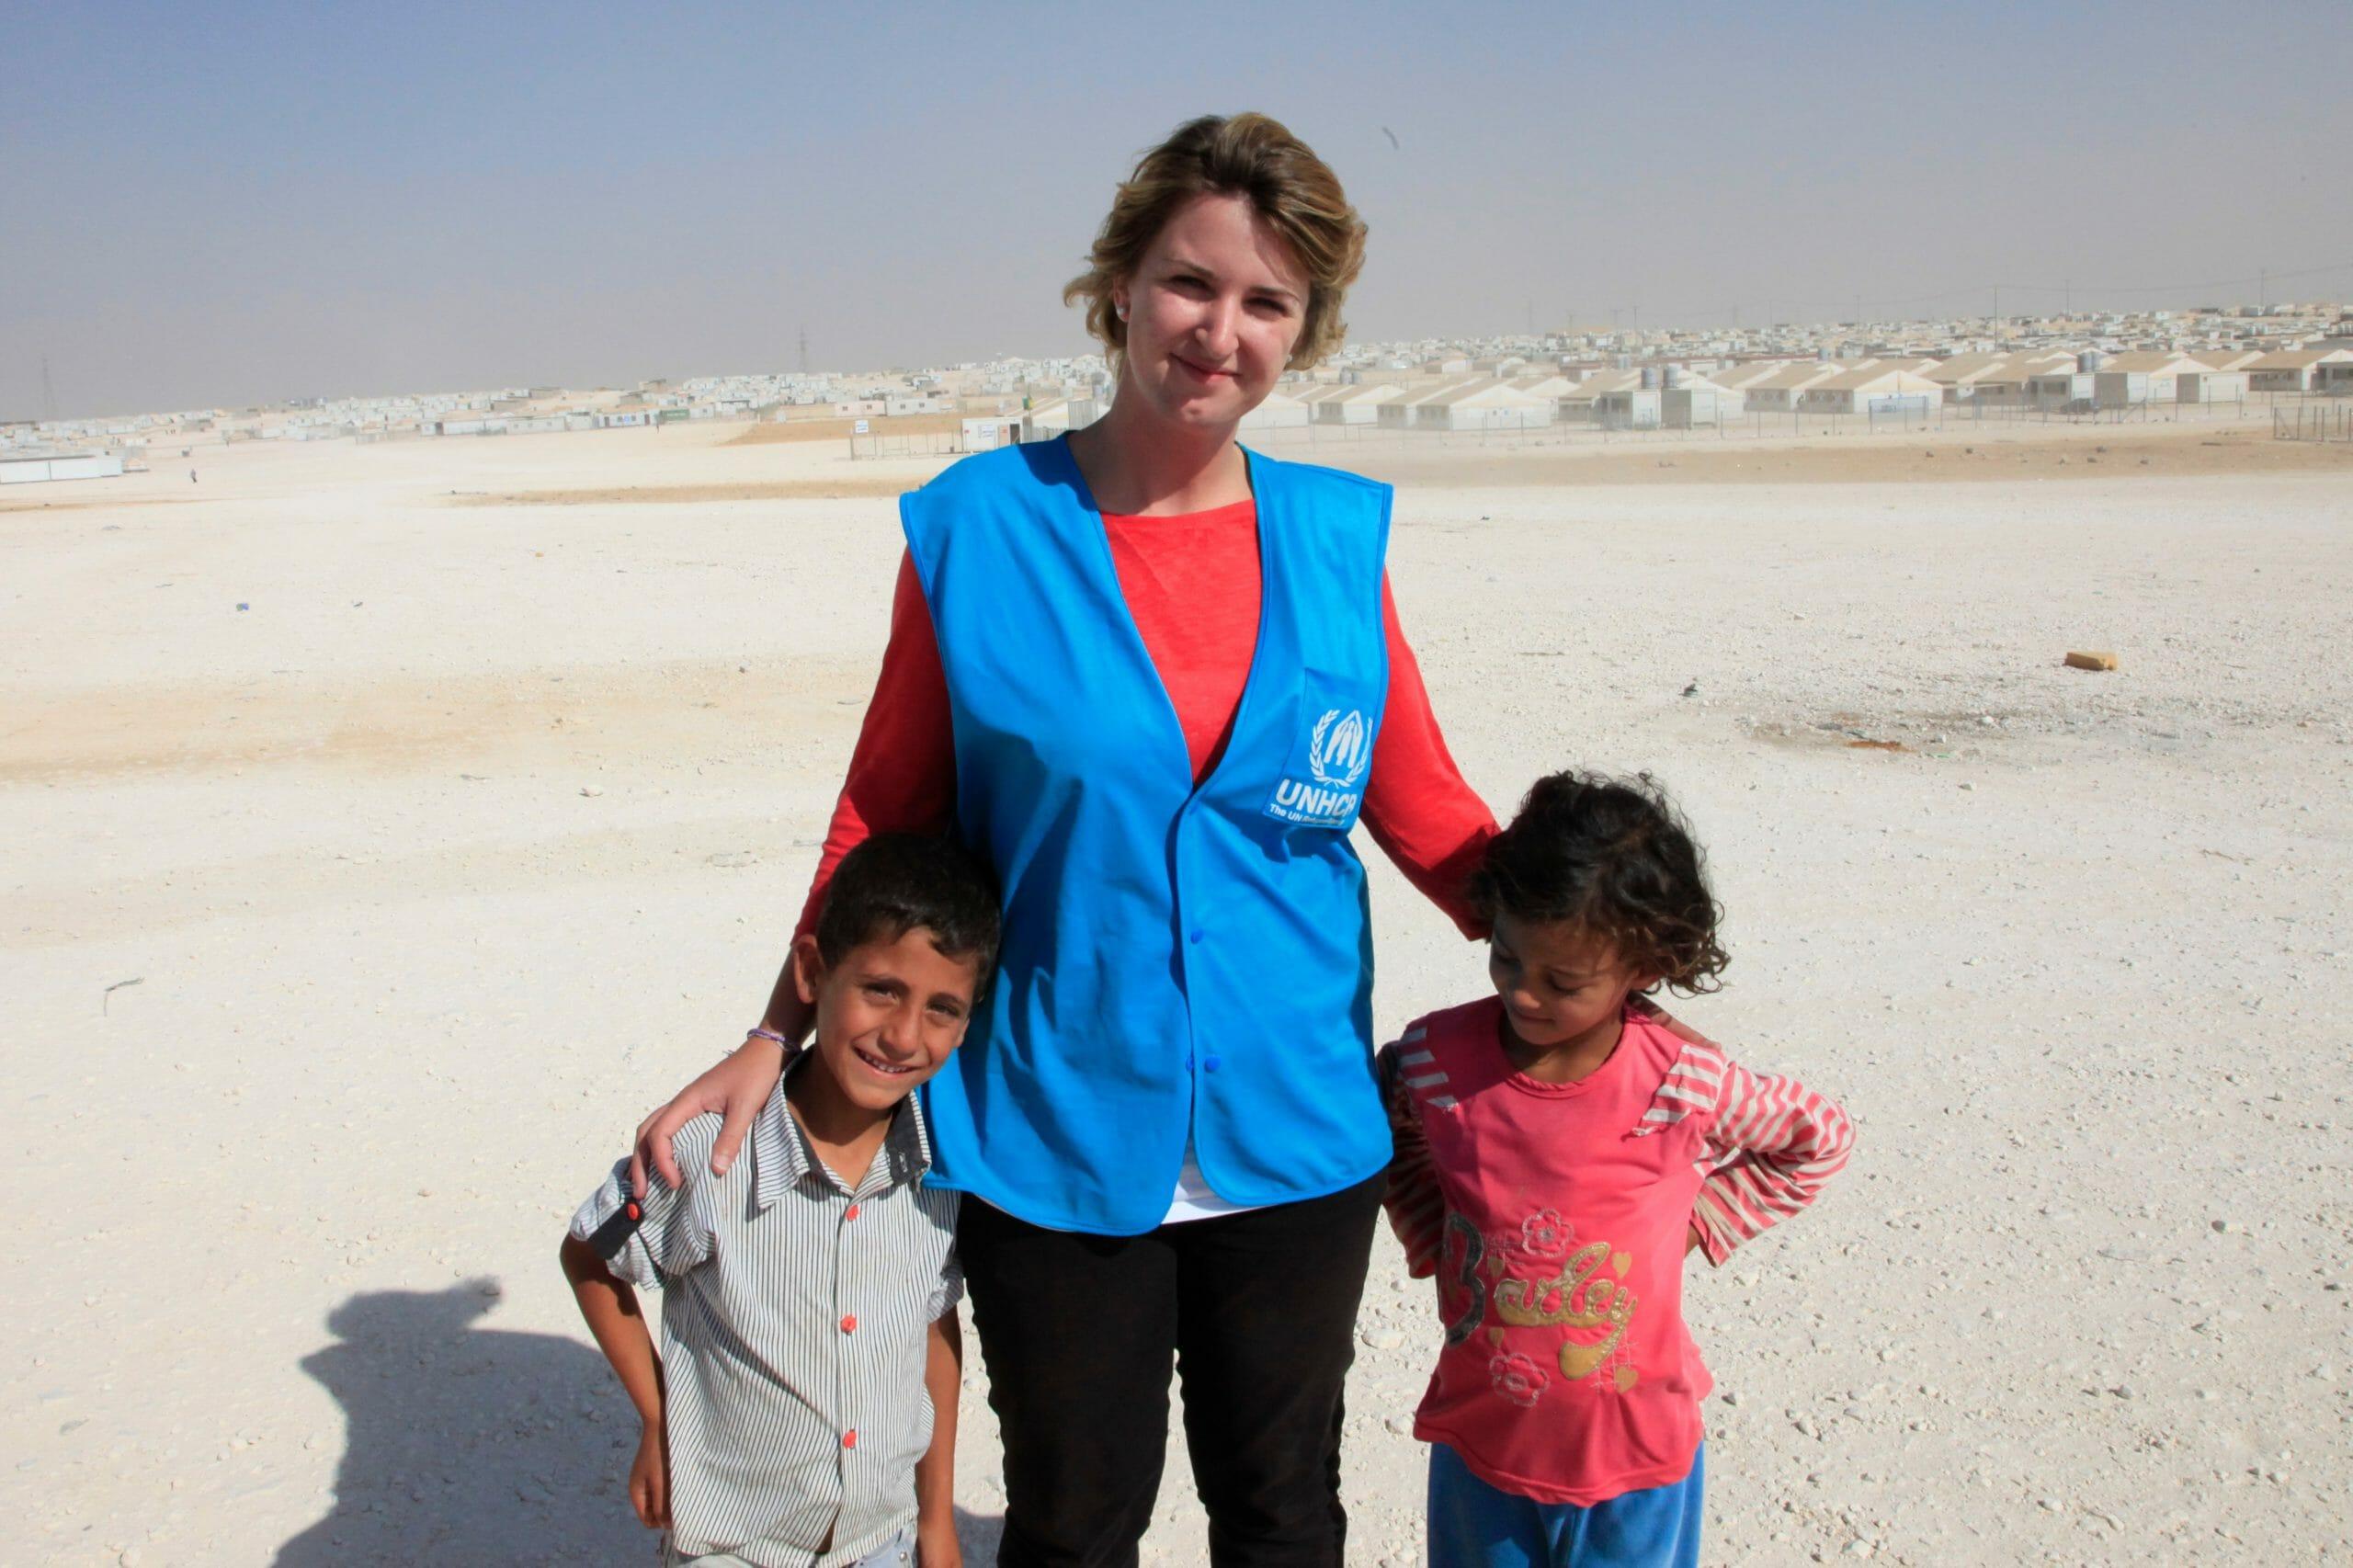 Read more about the article FAKTA: Hvad er FN's flygtningeorgan UNHCR?